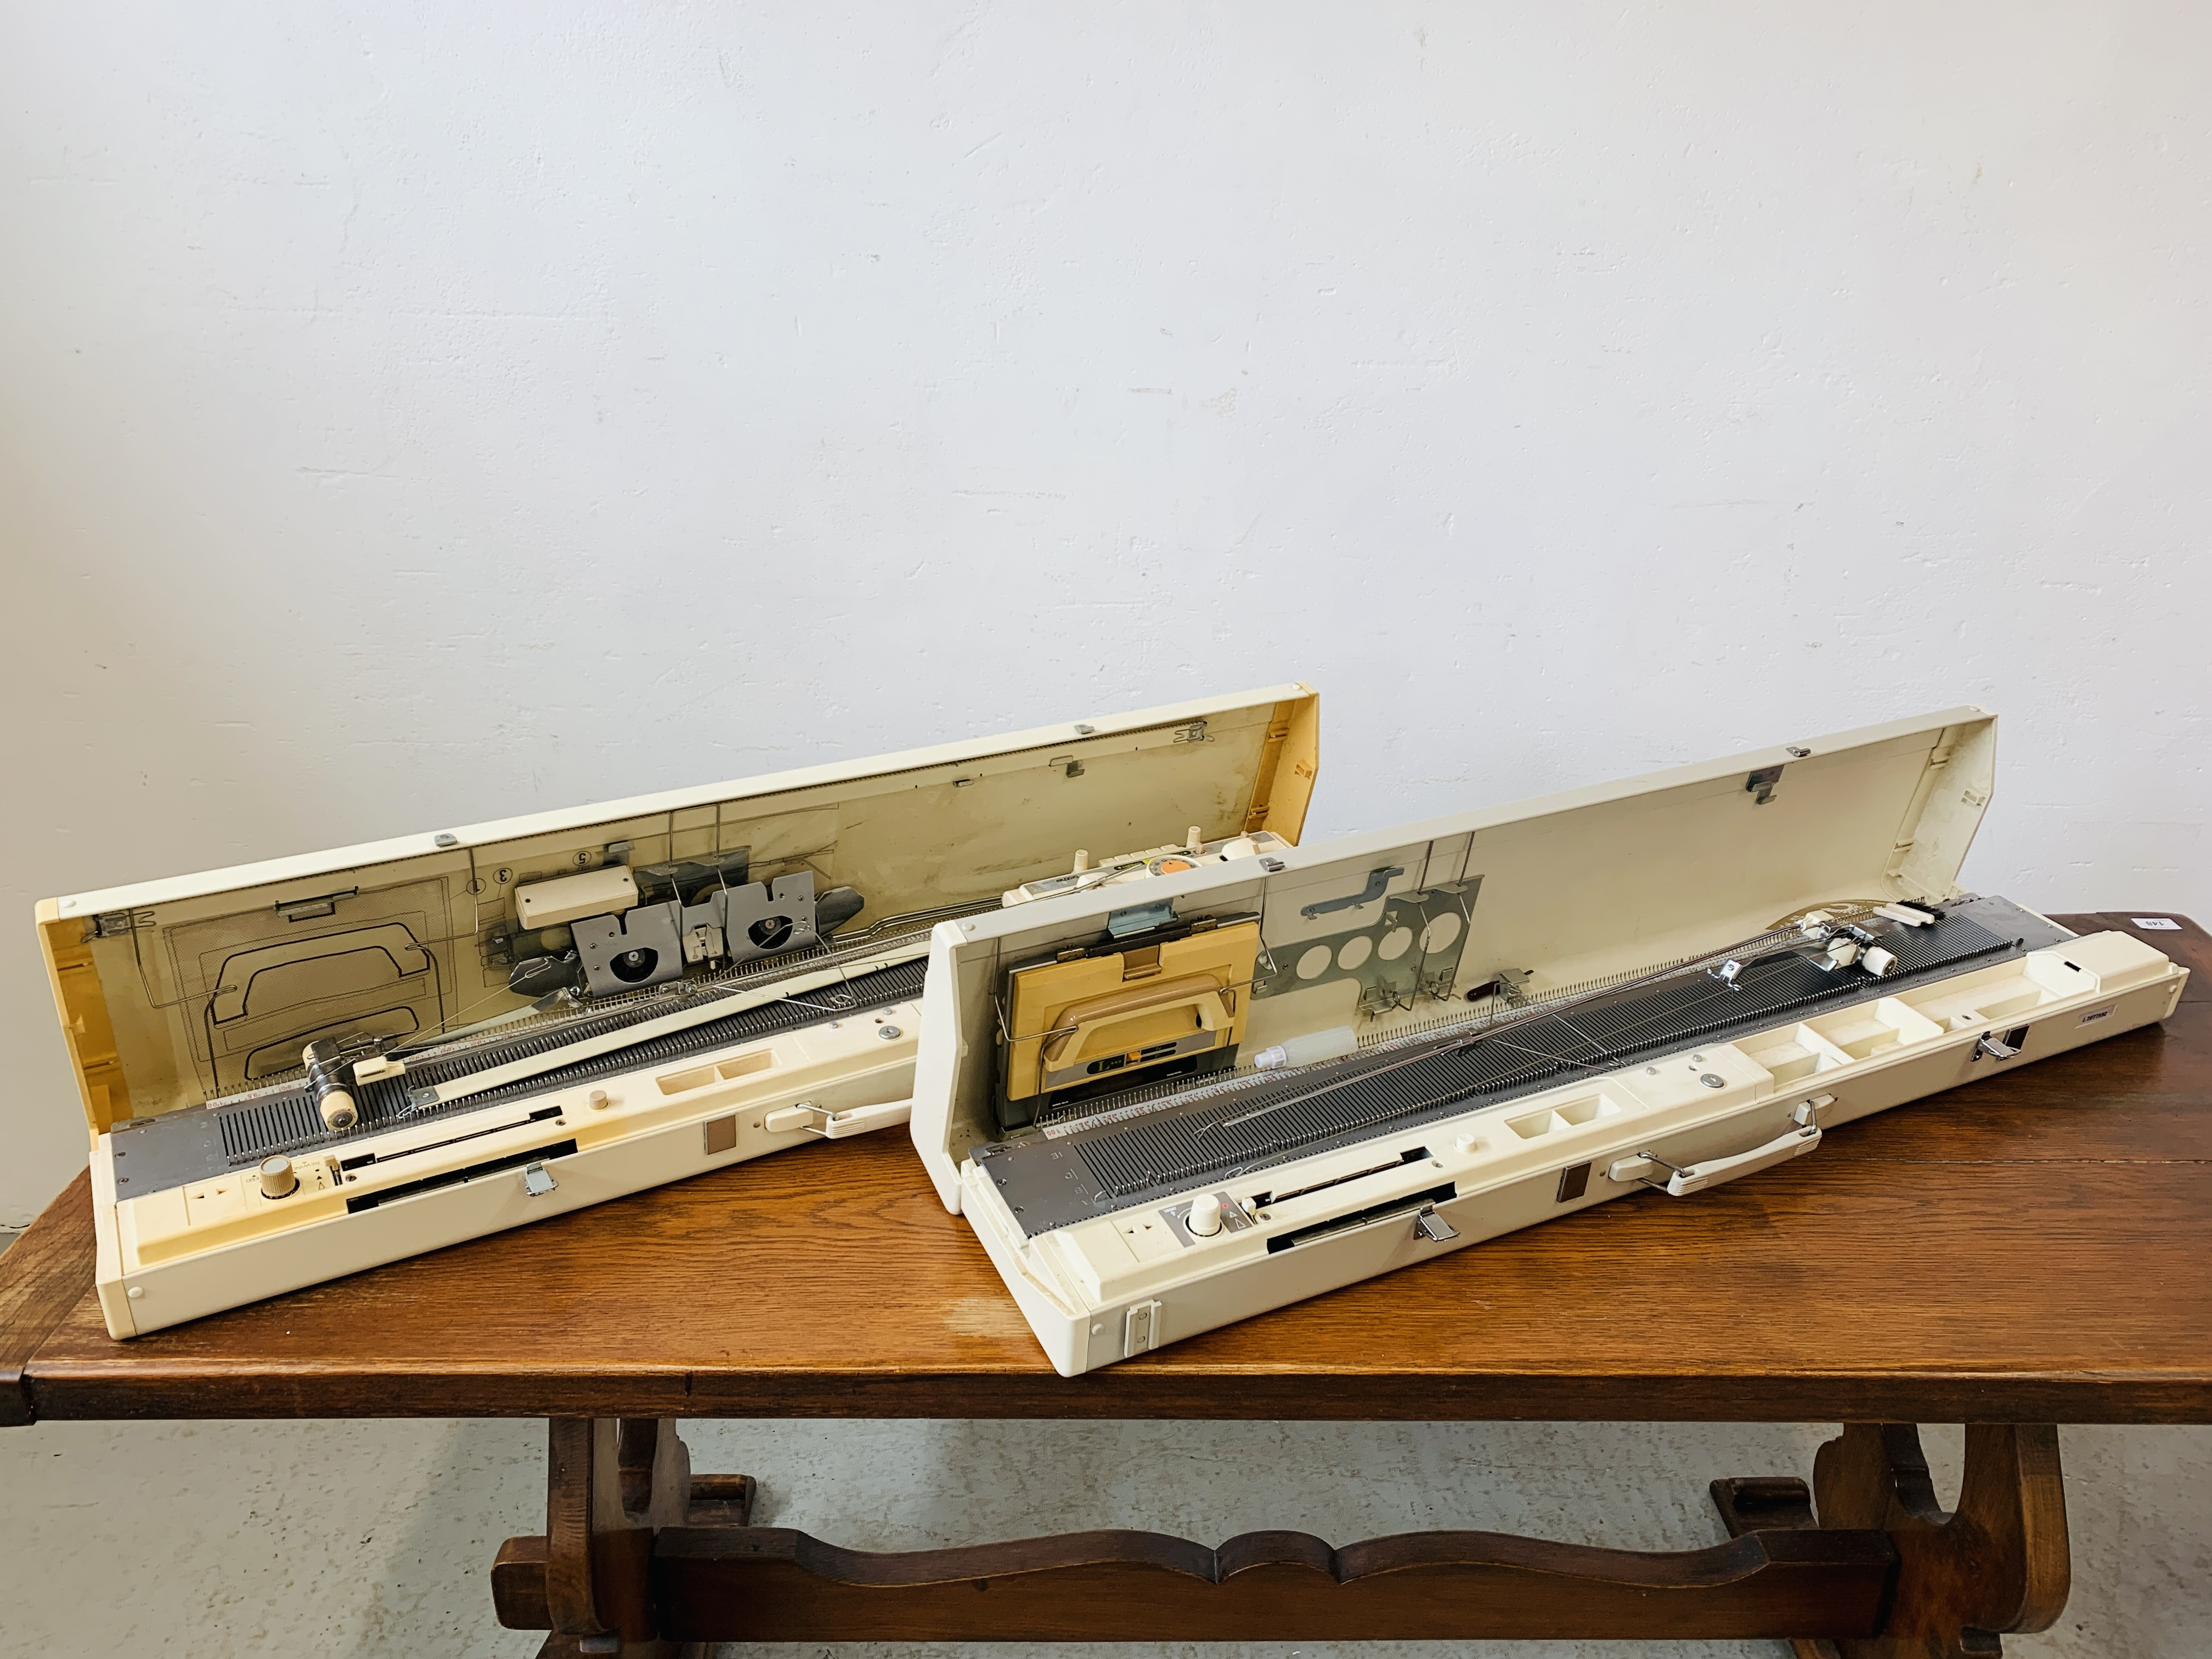 BROTHER KNITTING MACHINE KH - 830 + BROTHER KNITTING MACHINE KH - 890.